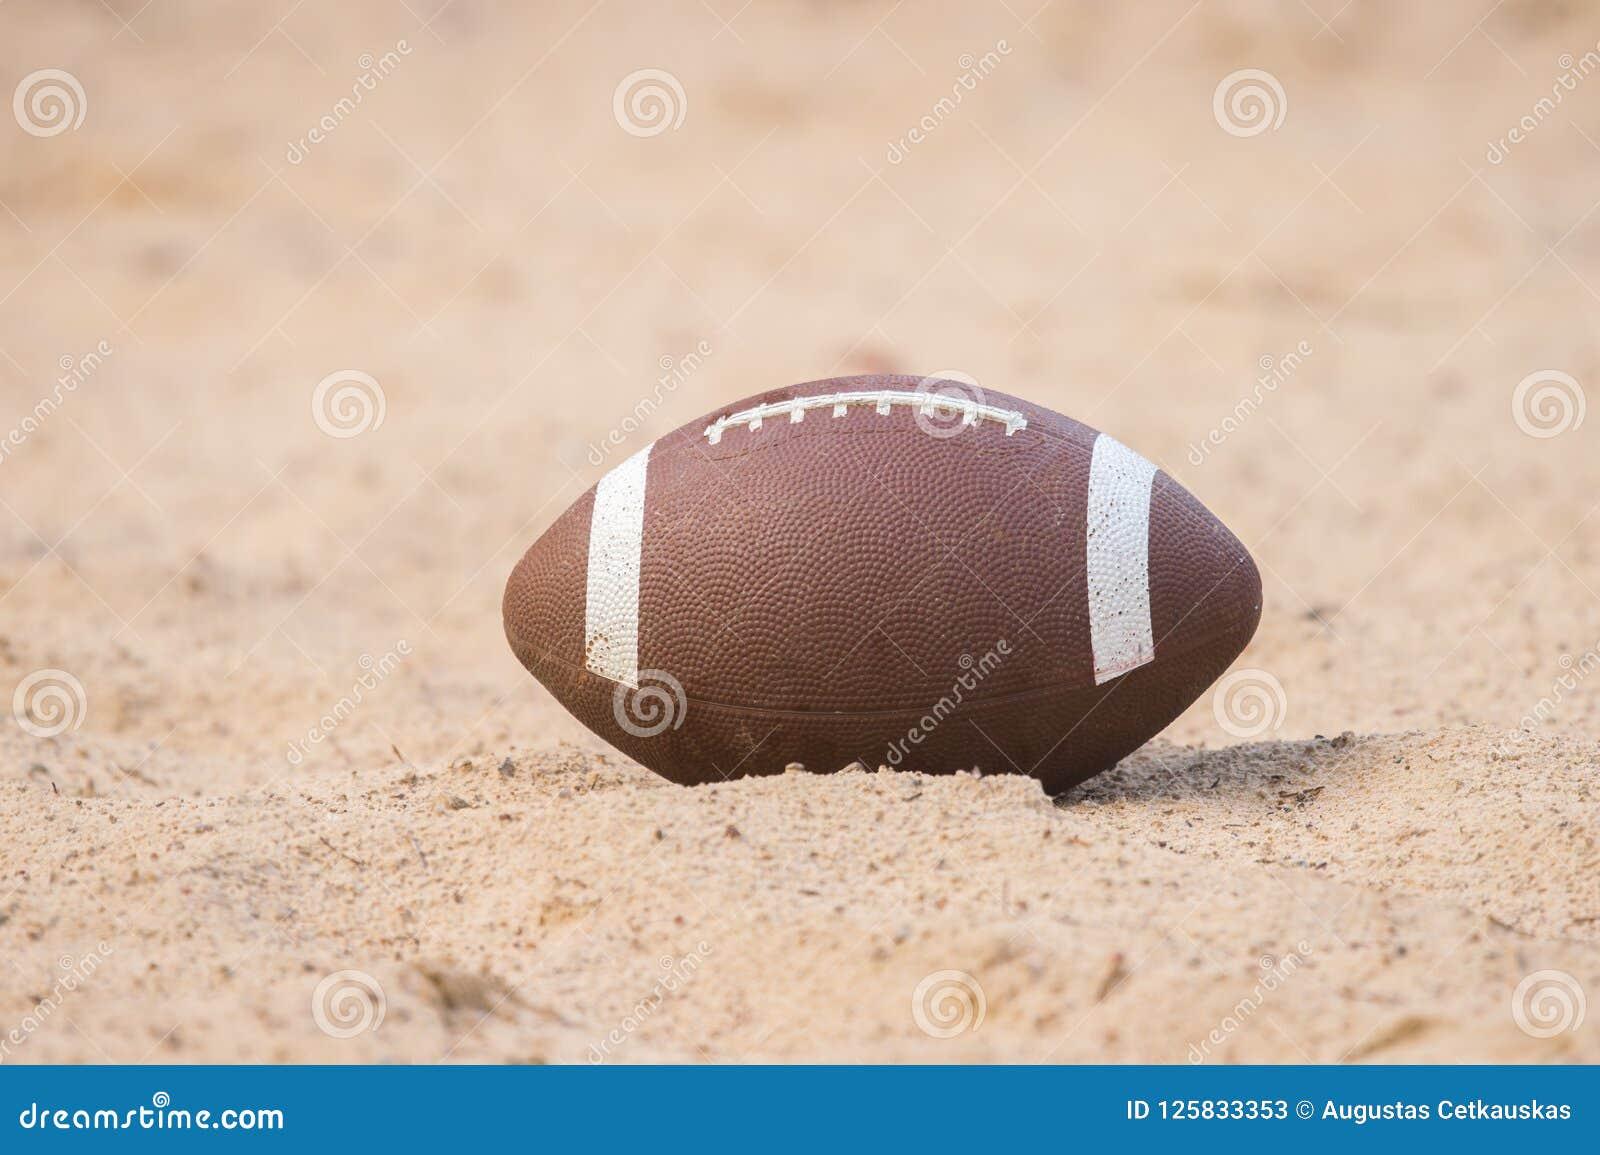 Amerikaanse voetbal in het zand op het strand